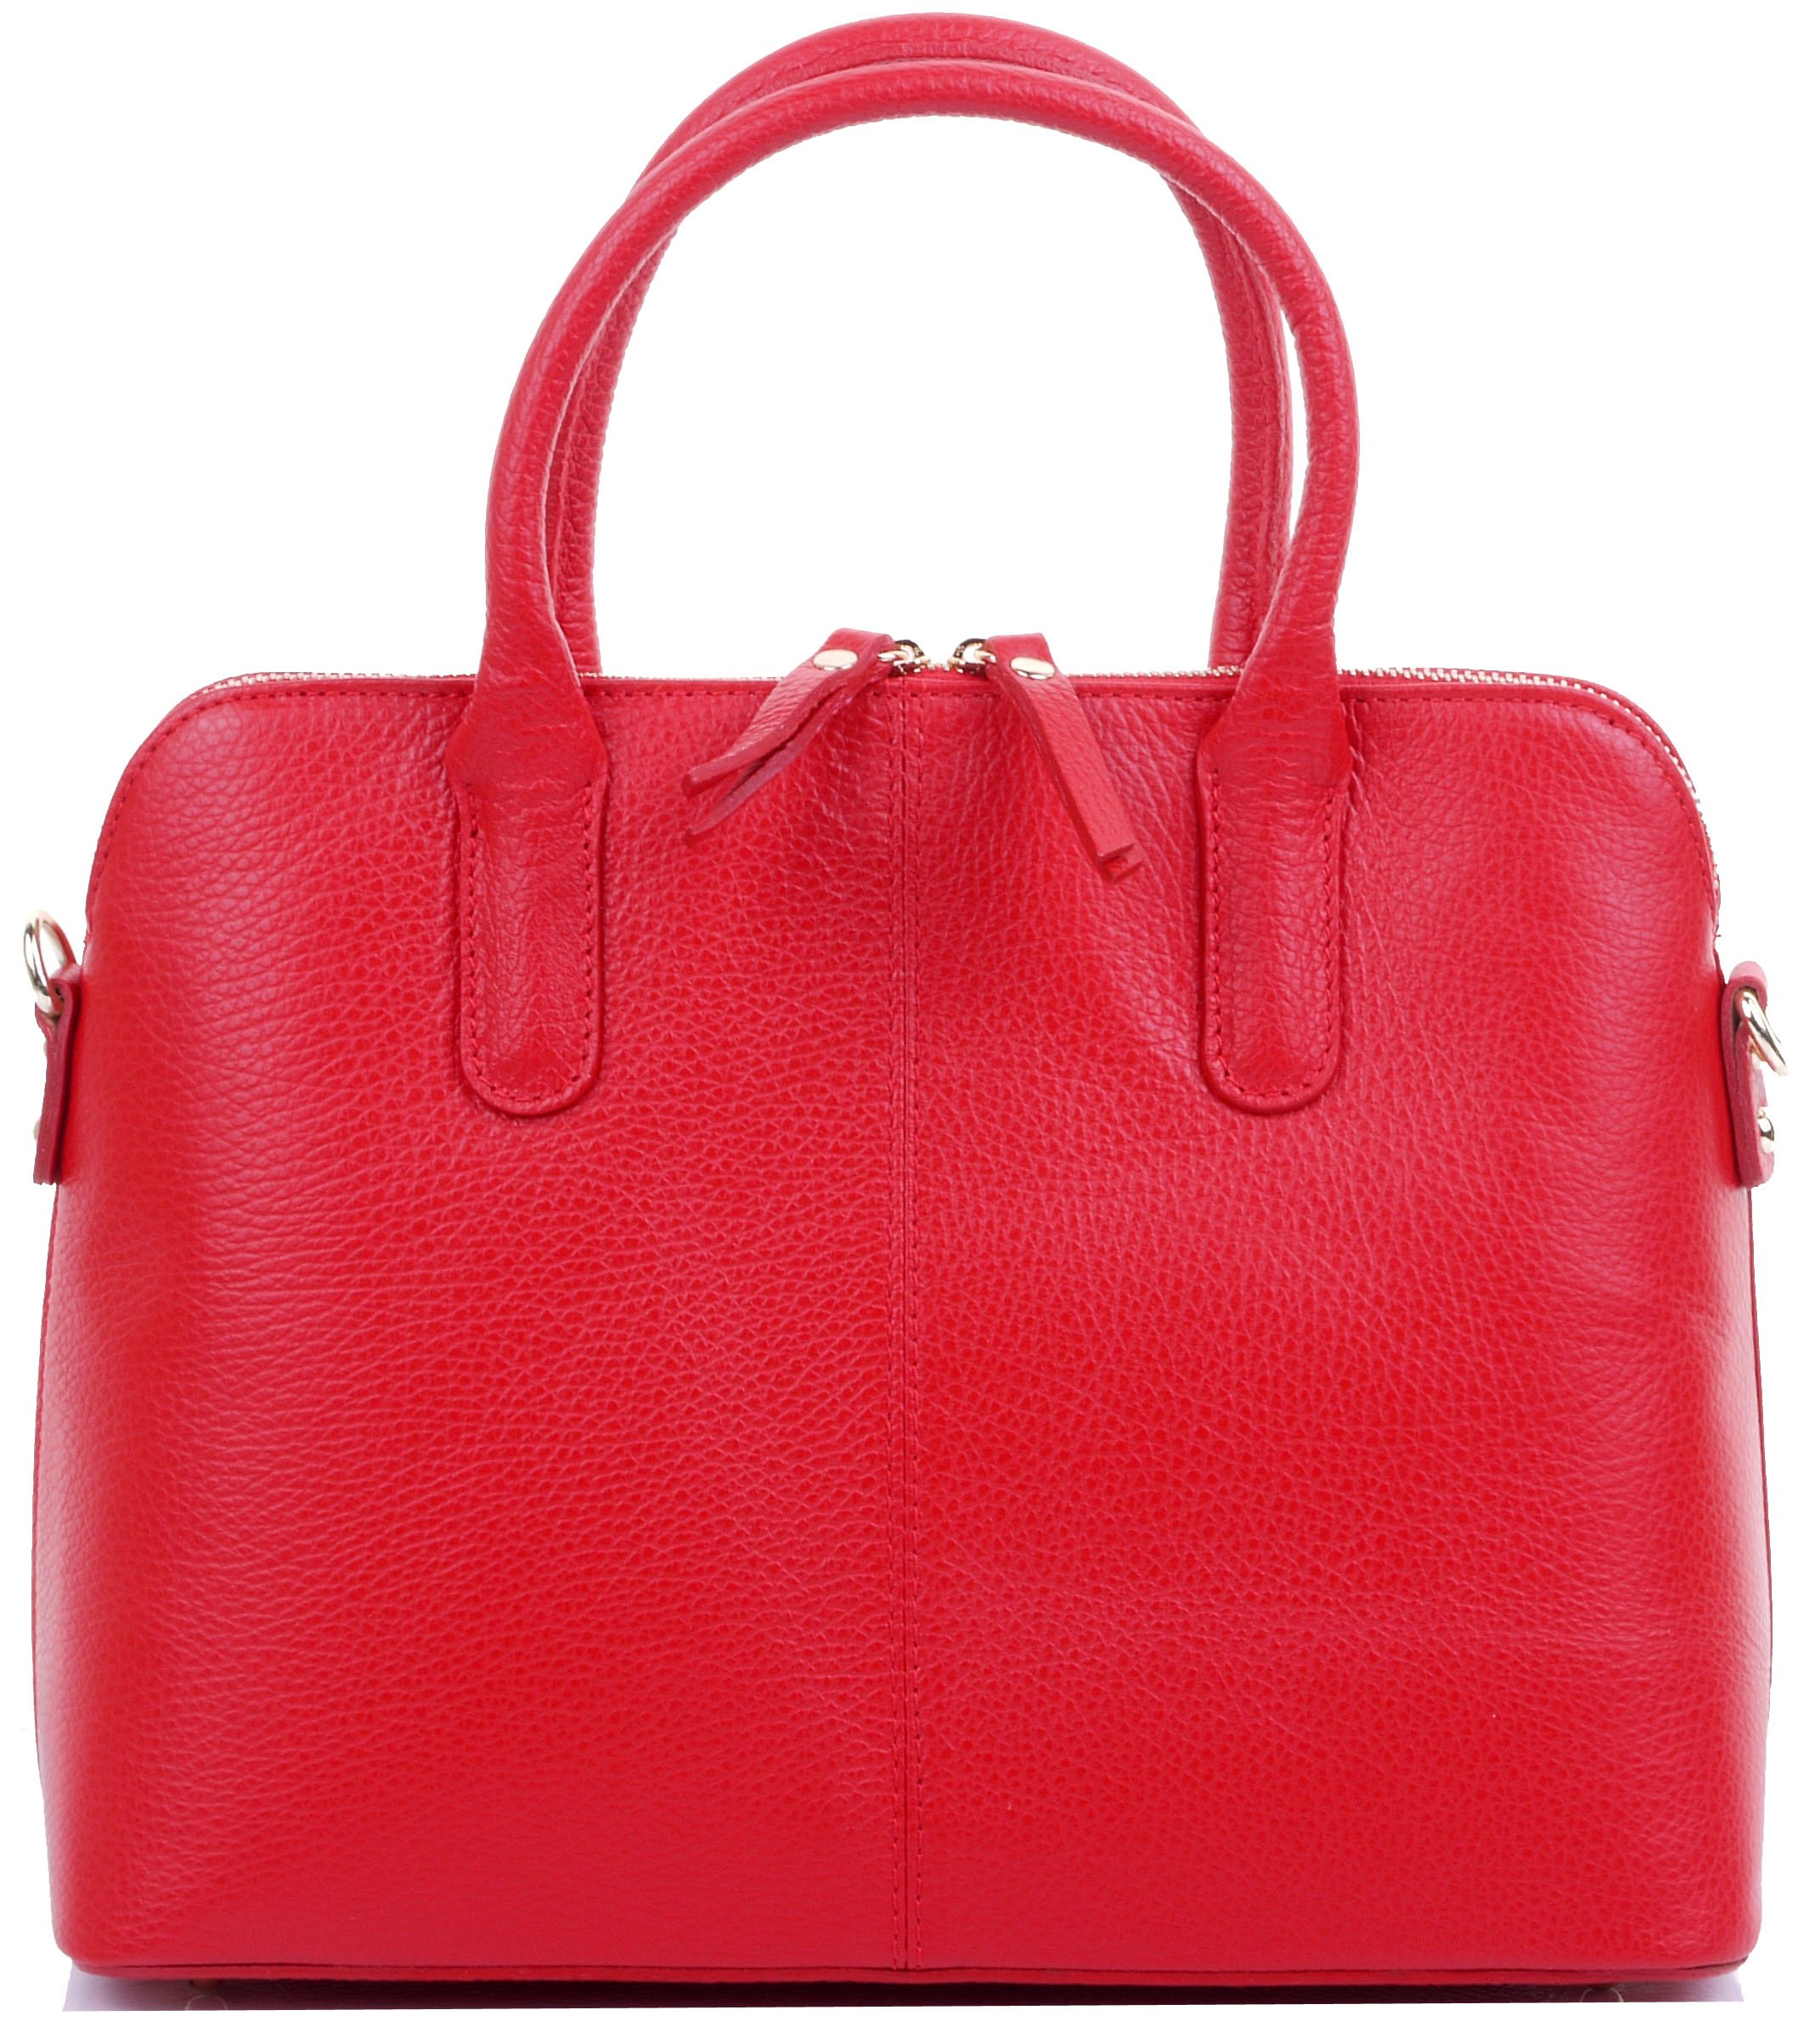 Primo Sacchi Italian Textured Red Leather Bowling Style Tote Grab Bag or Shoulder Bag Handbag